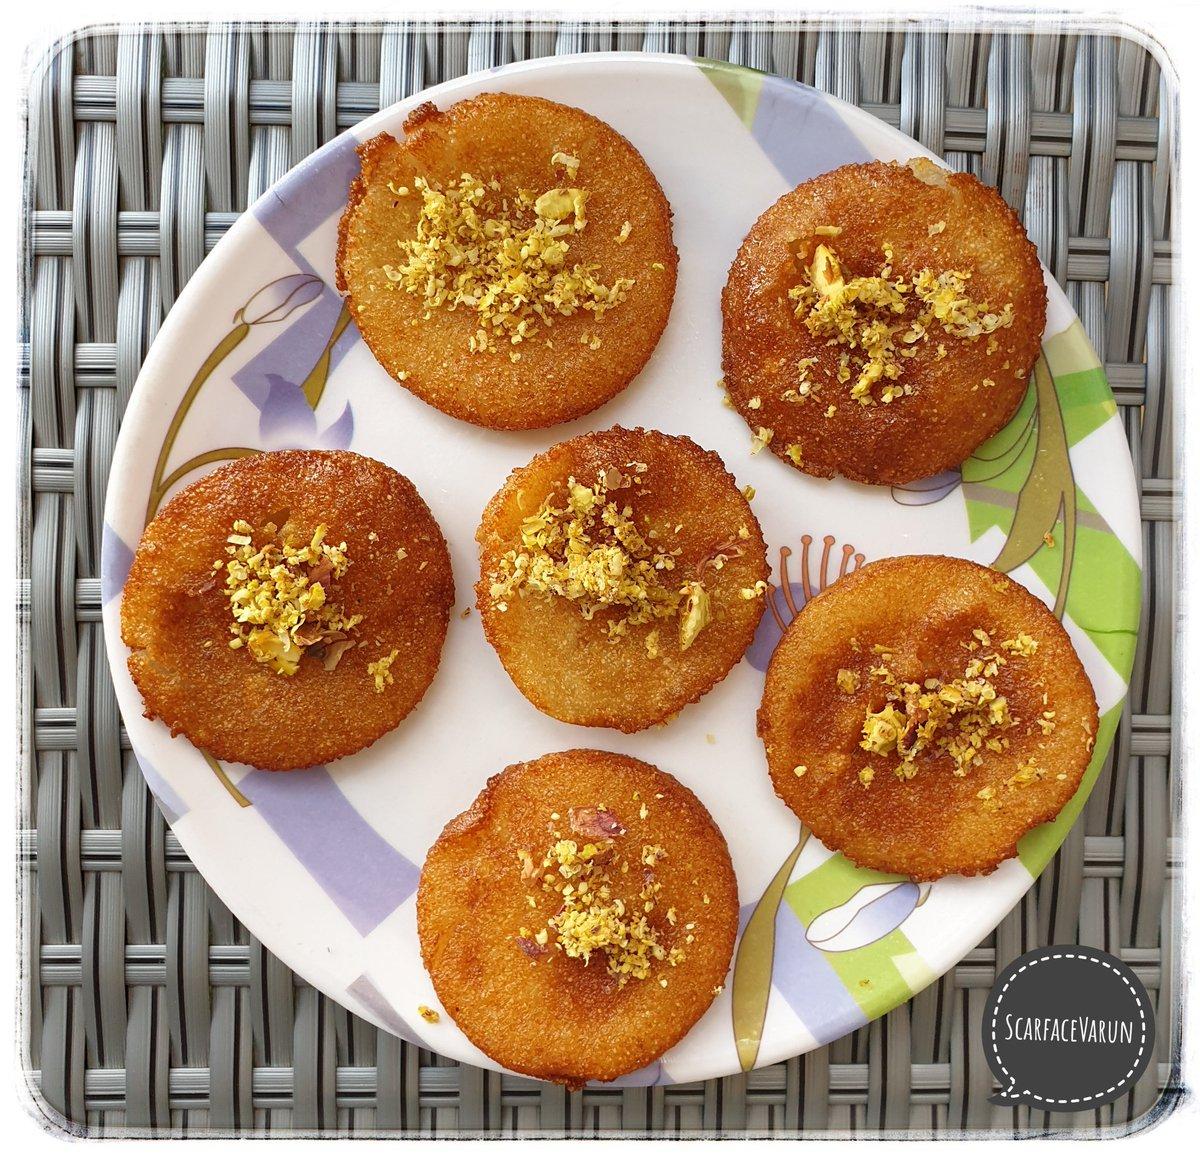 RAWA ka MALPUA!  by #ChefAMMA   Malpua made of Rawa/Sooji/Semolina. Flattened Semolina fried in Chashni,with dry fruit shavings.  #Food #foodblogger #foodblog #foodgasm #Mumbai #India #yummy #amazing #dinner #delicious #photooftoday #Sweet #Dessert #Desserts #DessertOfTheDay https://t.co/dCGvLVrlTr